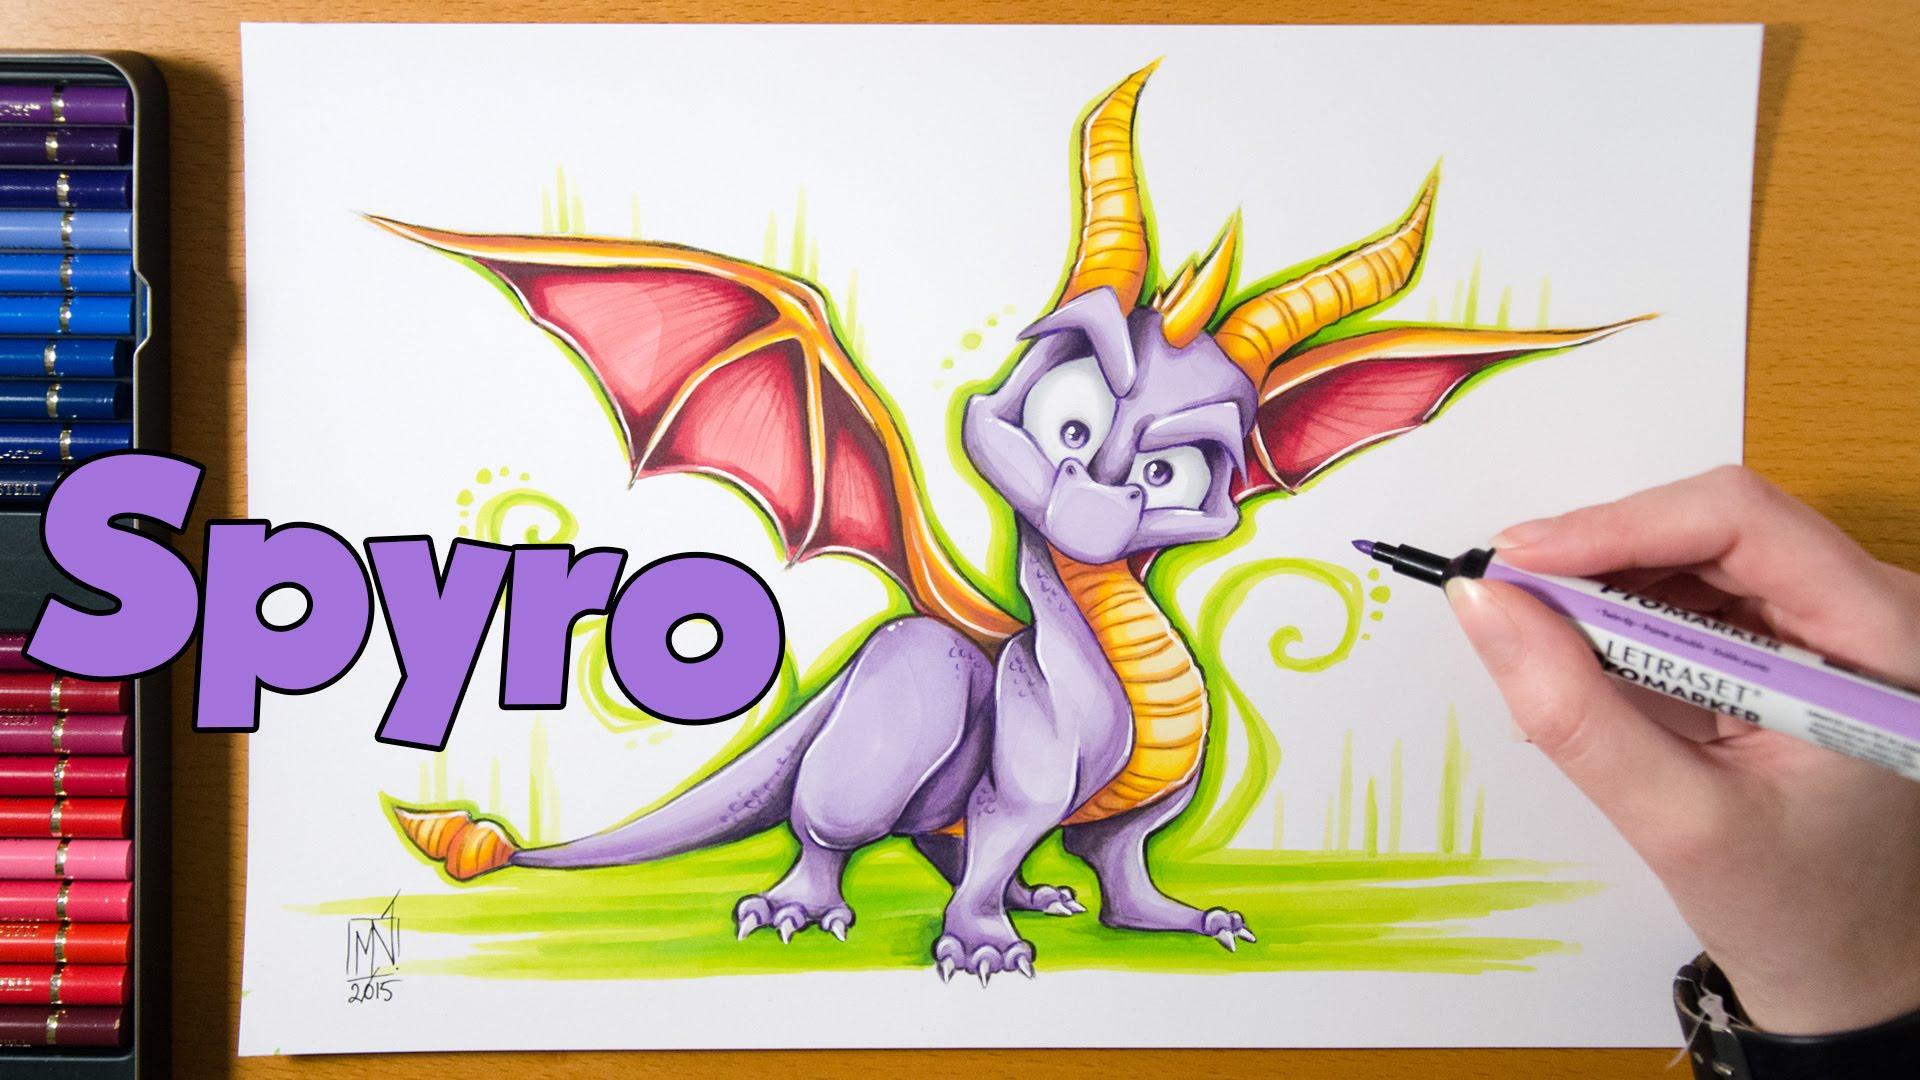 spyro the dragon iso español